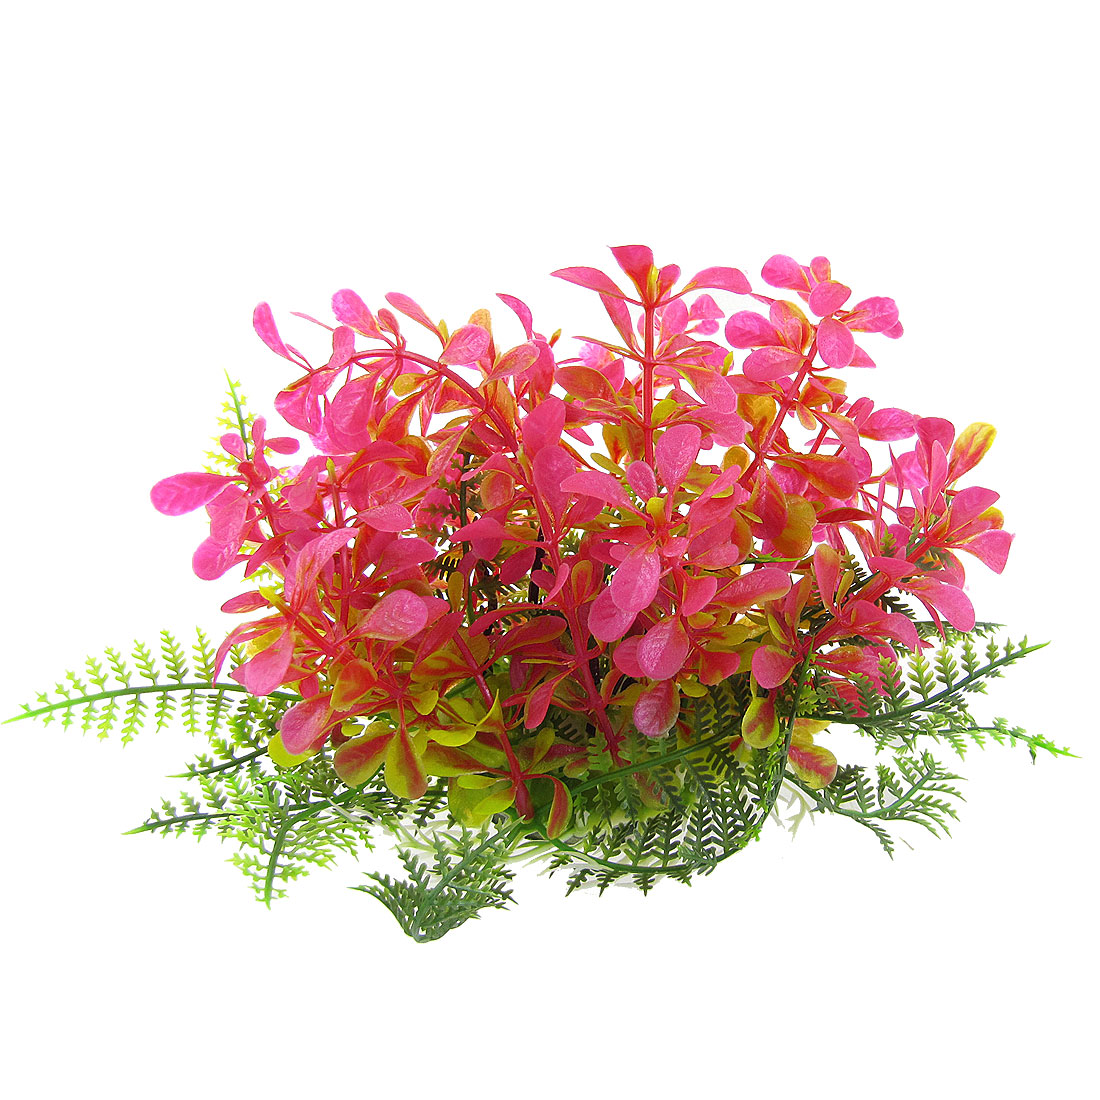 "Fish Tank Aquarium Plastic Fuchsia Green Grass Plant Decor 5"" Height"